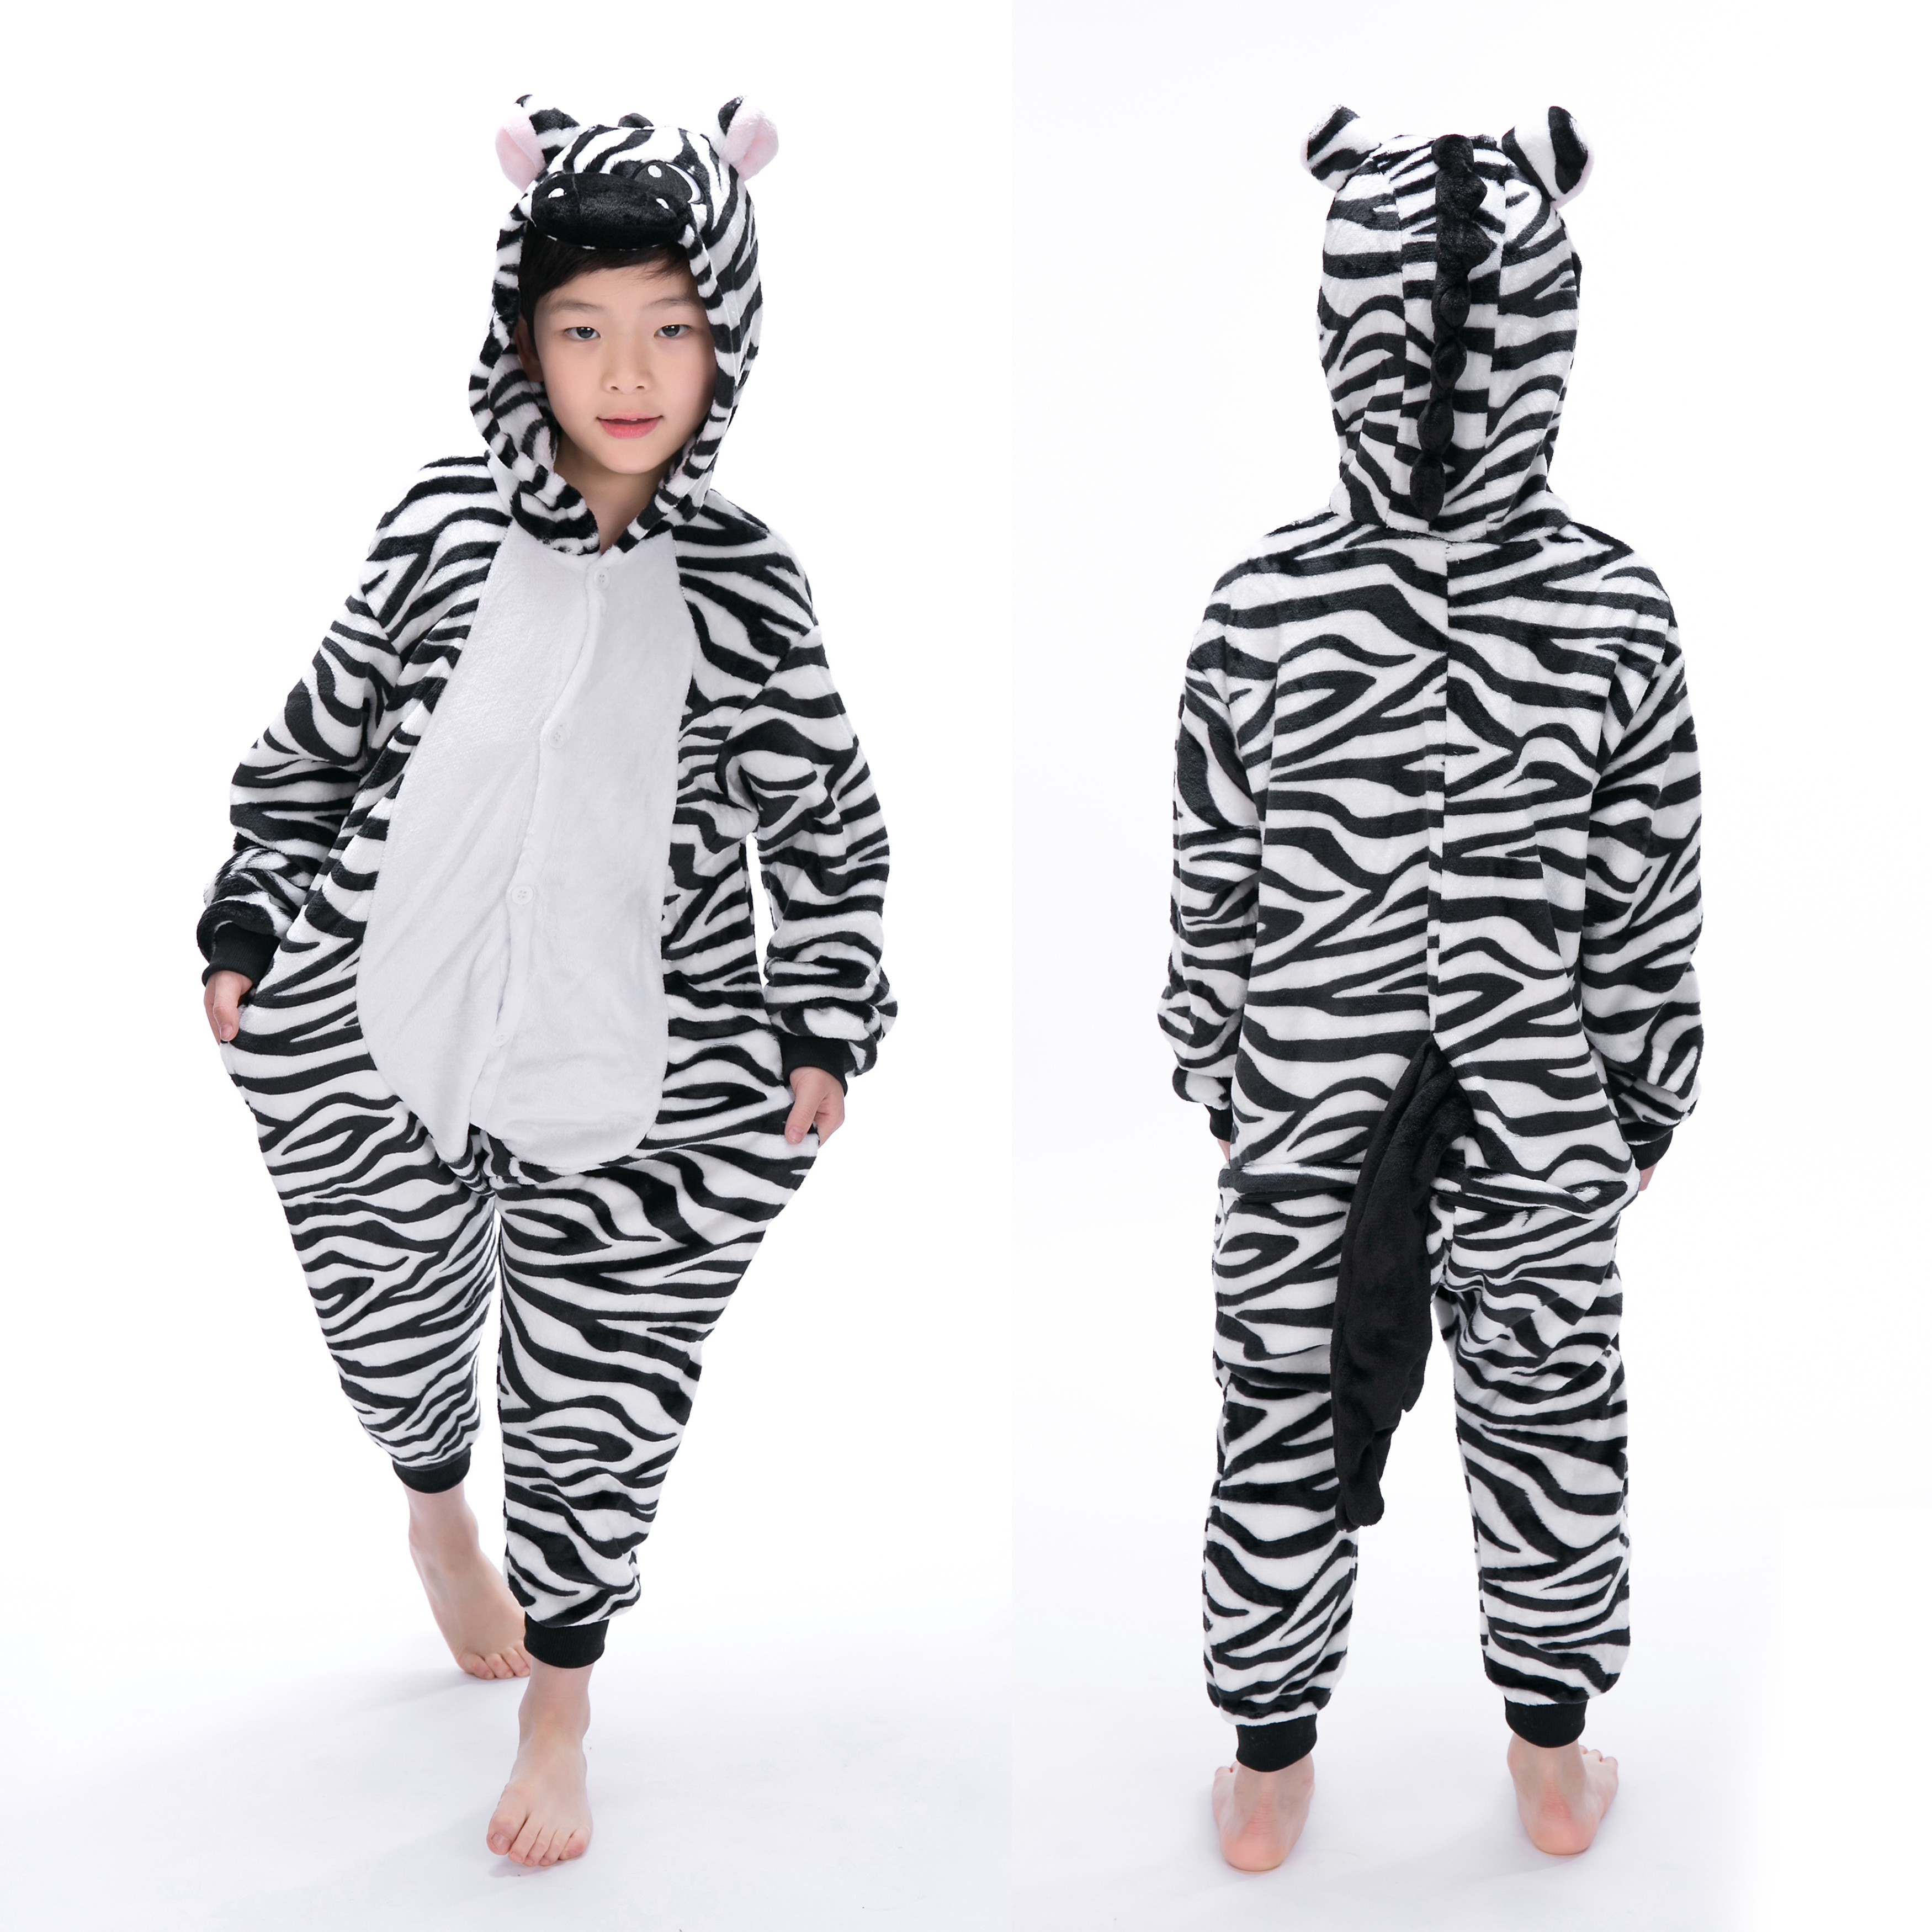 Zebra Onesie Animal Pajama for Kid Kigurumi Halloween Party Costumes aadc43099